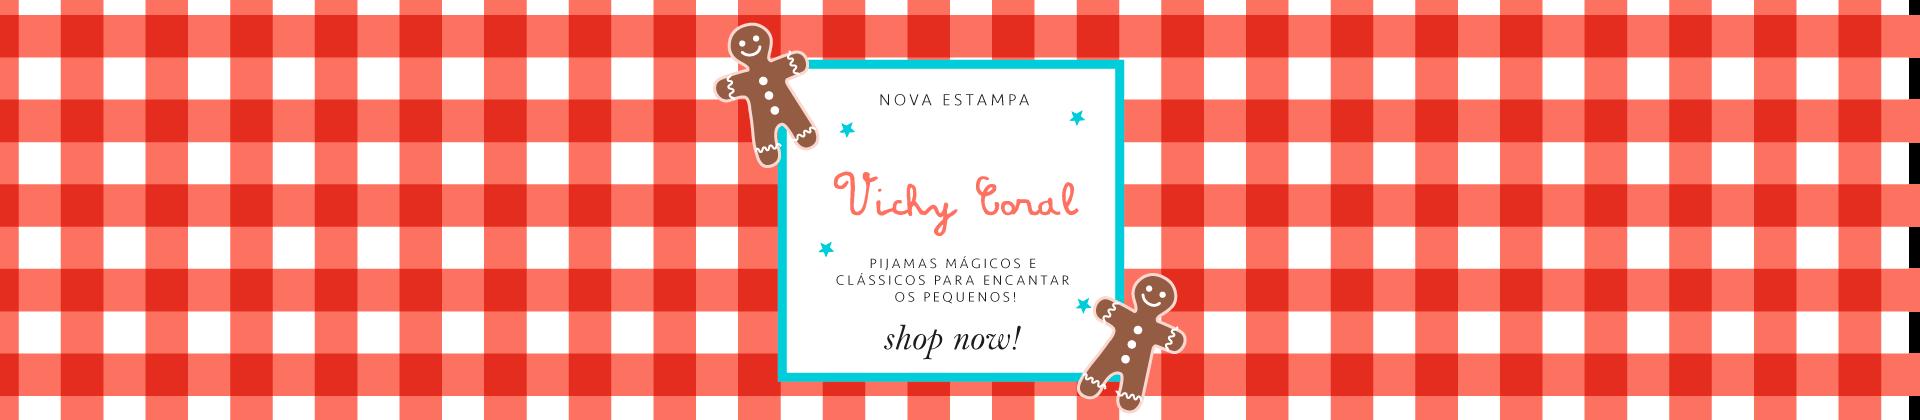 Cookie Dreams Pijamas Algodão Pima Peruano VICHY CORAL Home 1